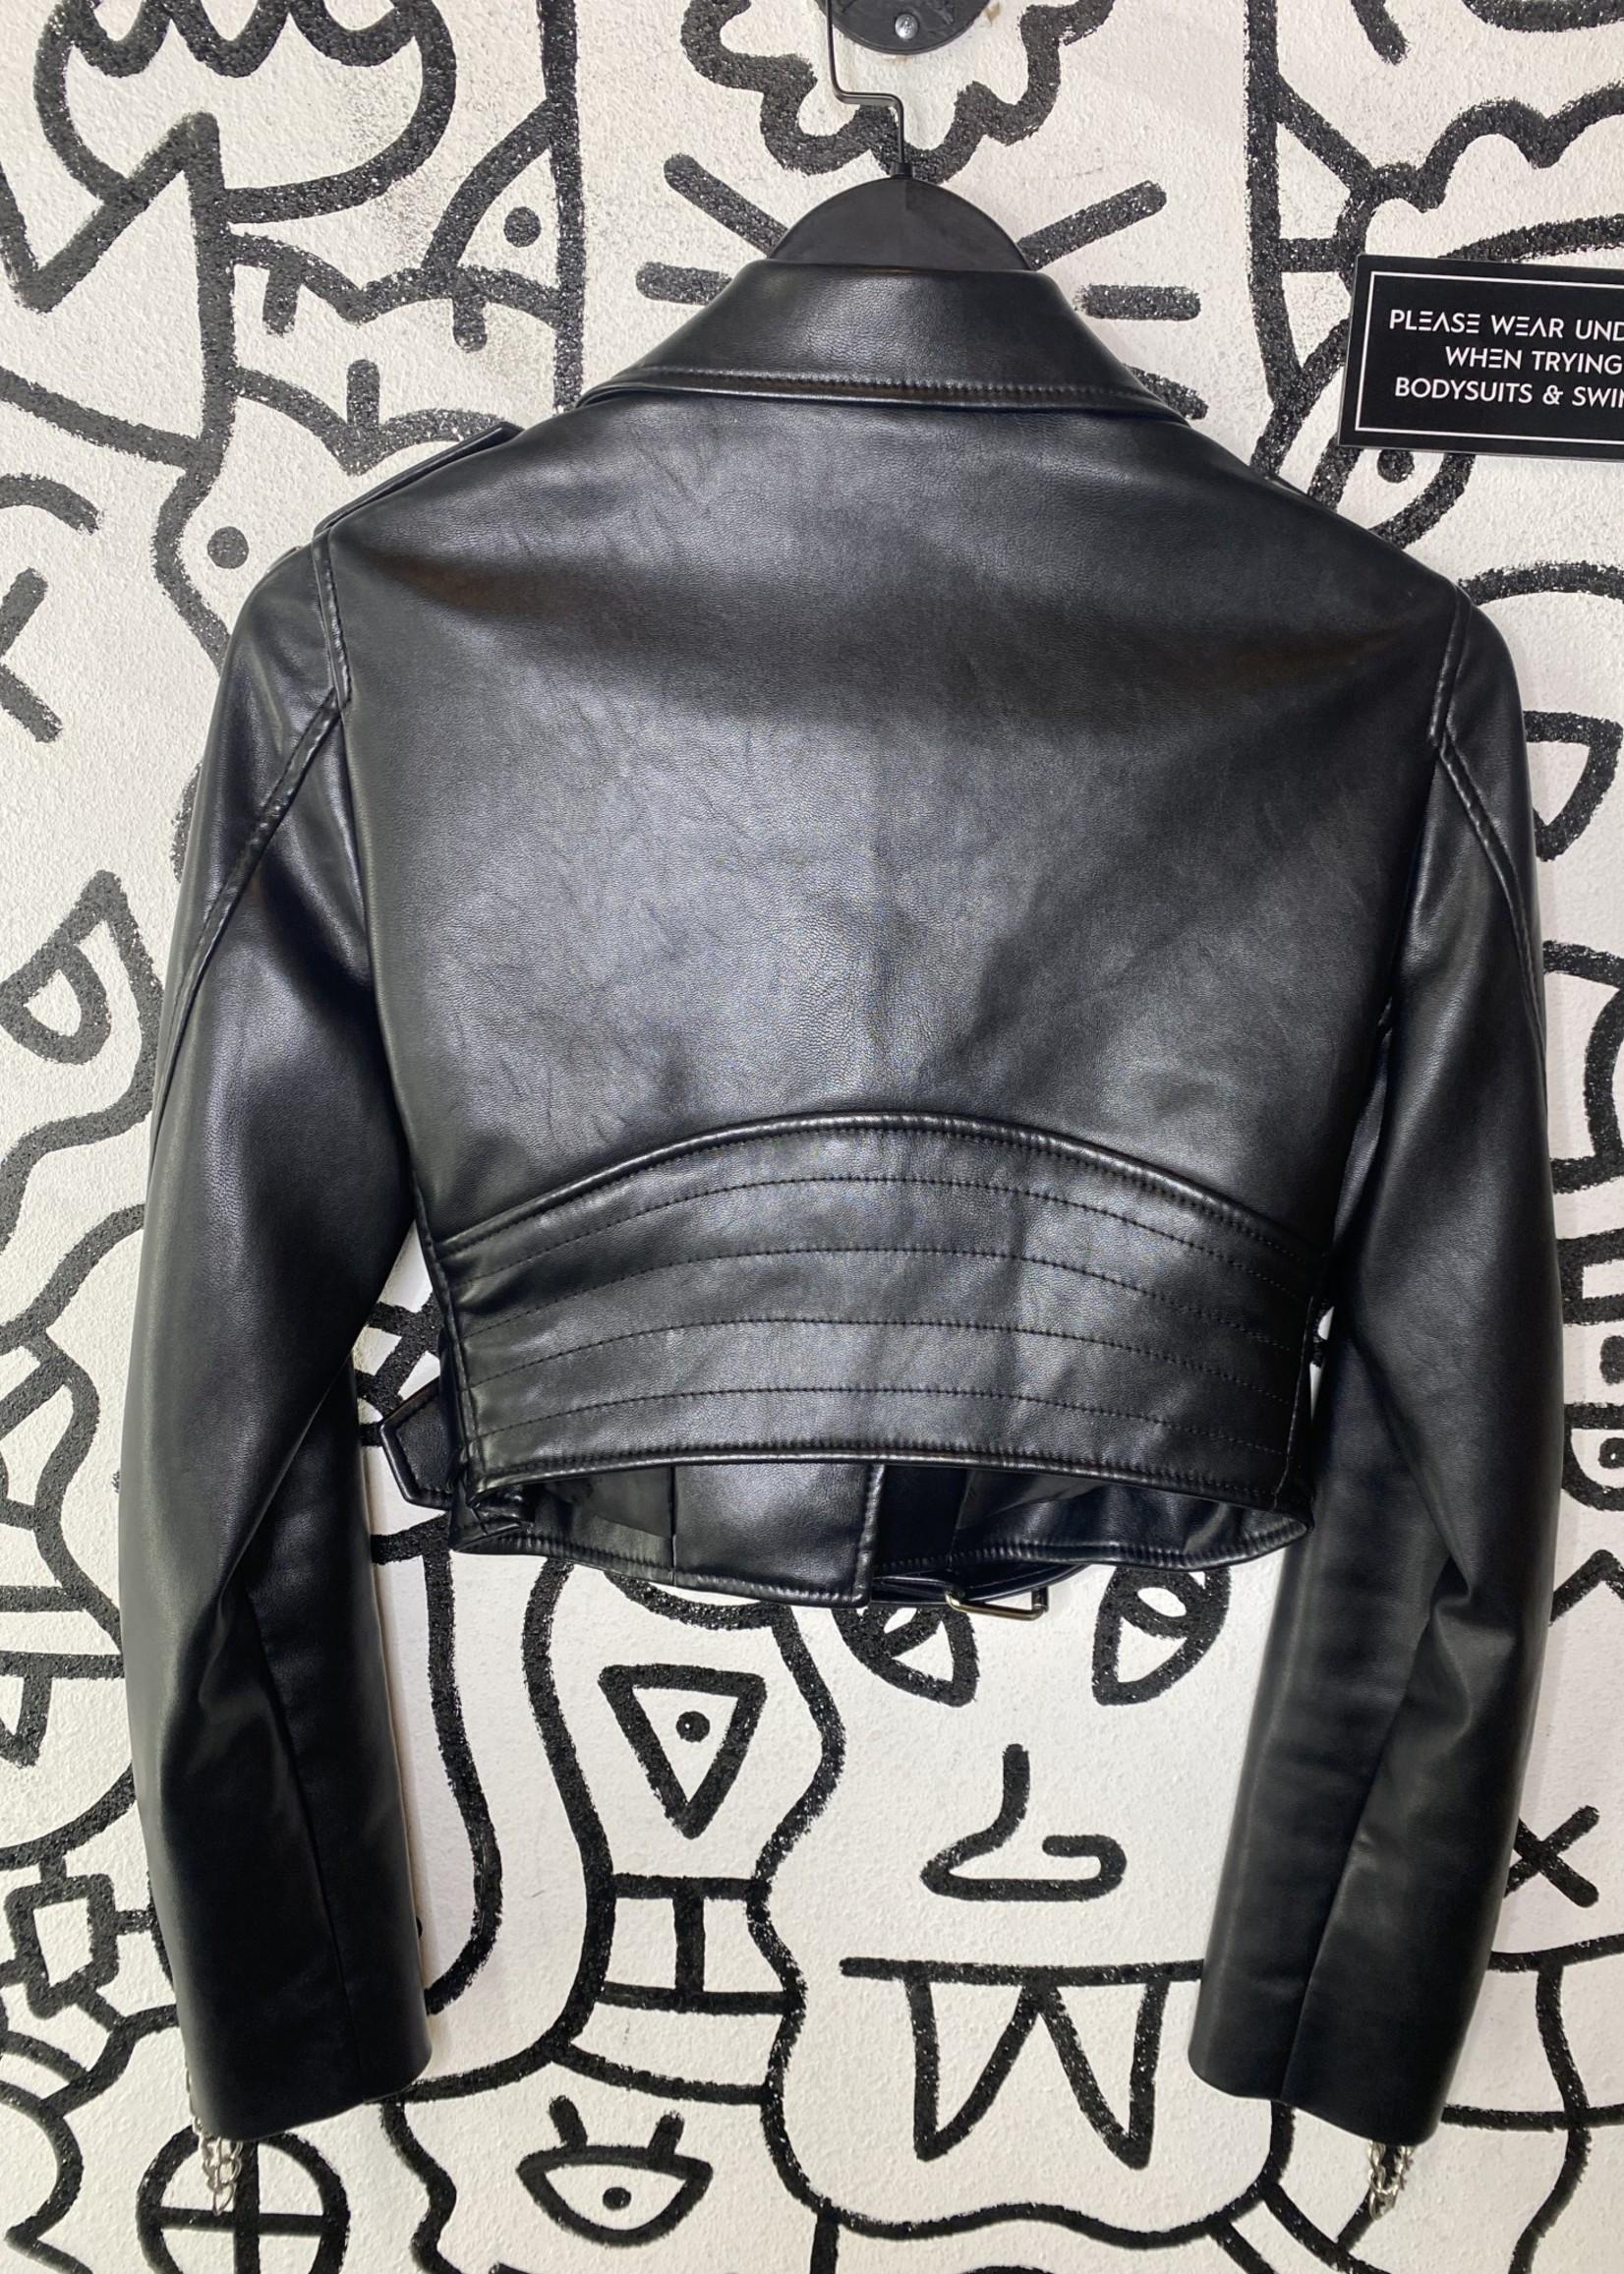 Moschino Runway Vegan Leather Cropped Moto Jacket Spring 2018 (Retail: $2600)